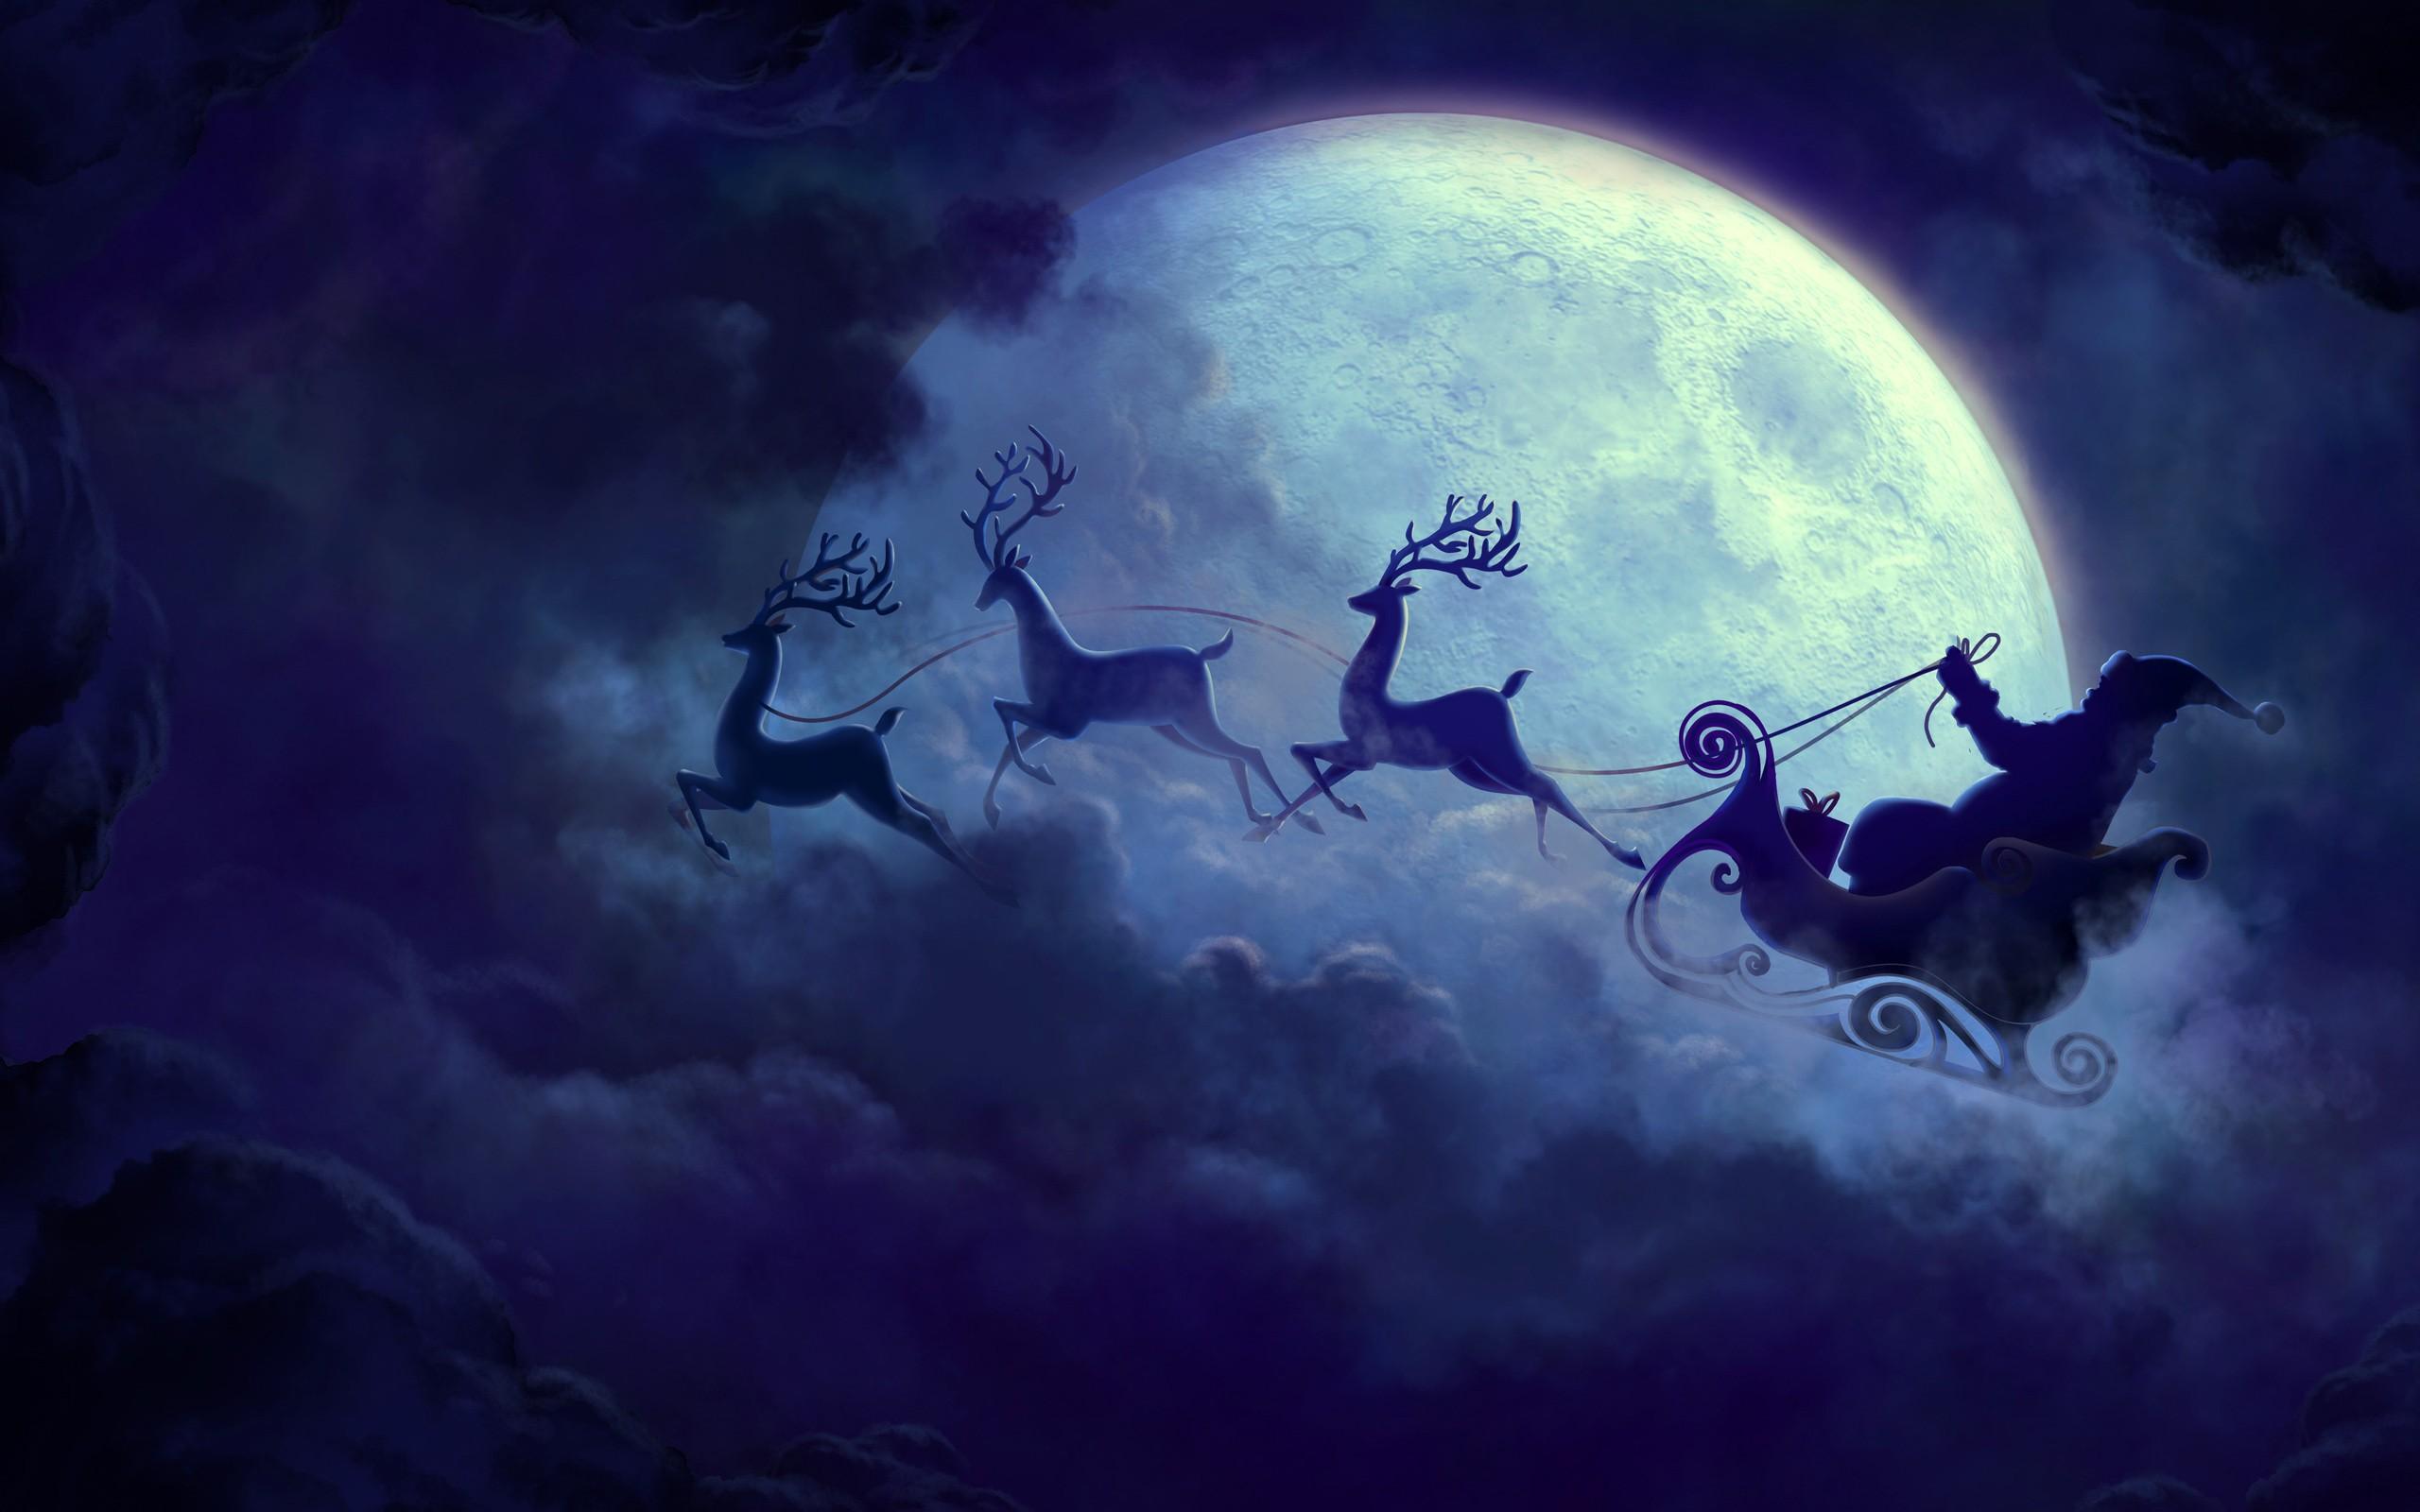 Santa Claus Moon Hd Celebrations 4k Wallpapers Images